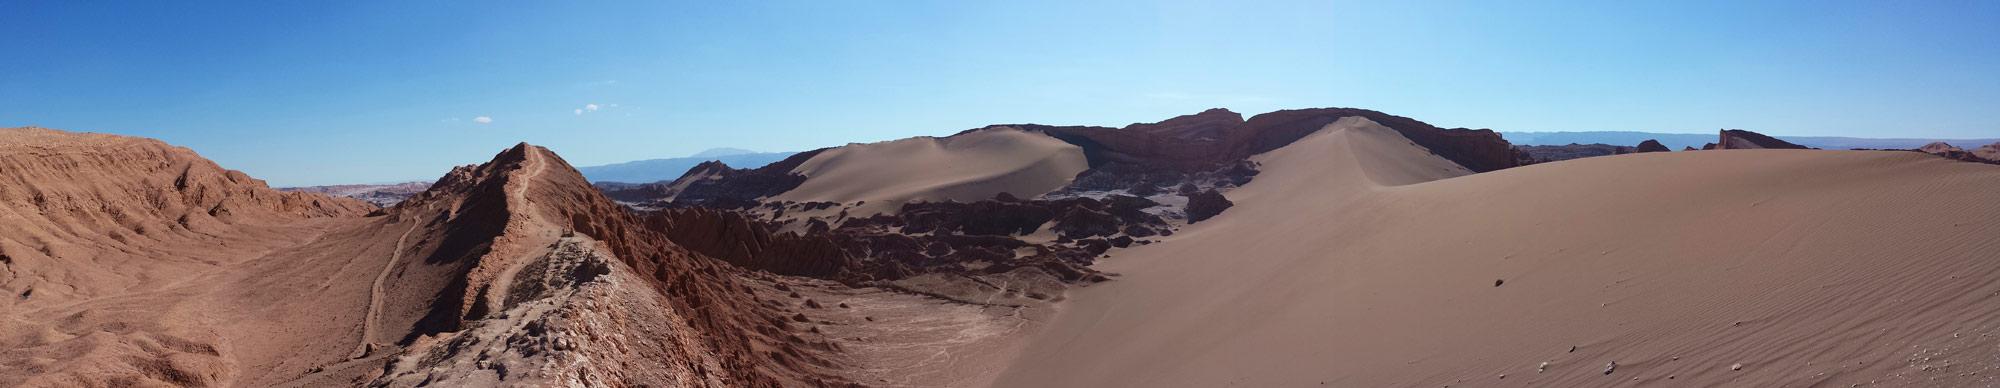 Image of Panorama from Valle de la Luna.